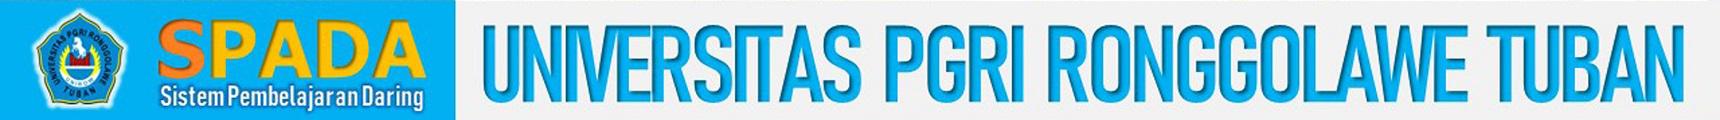 Logo dari SPADA UNIROW TUBAN